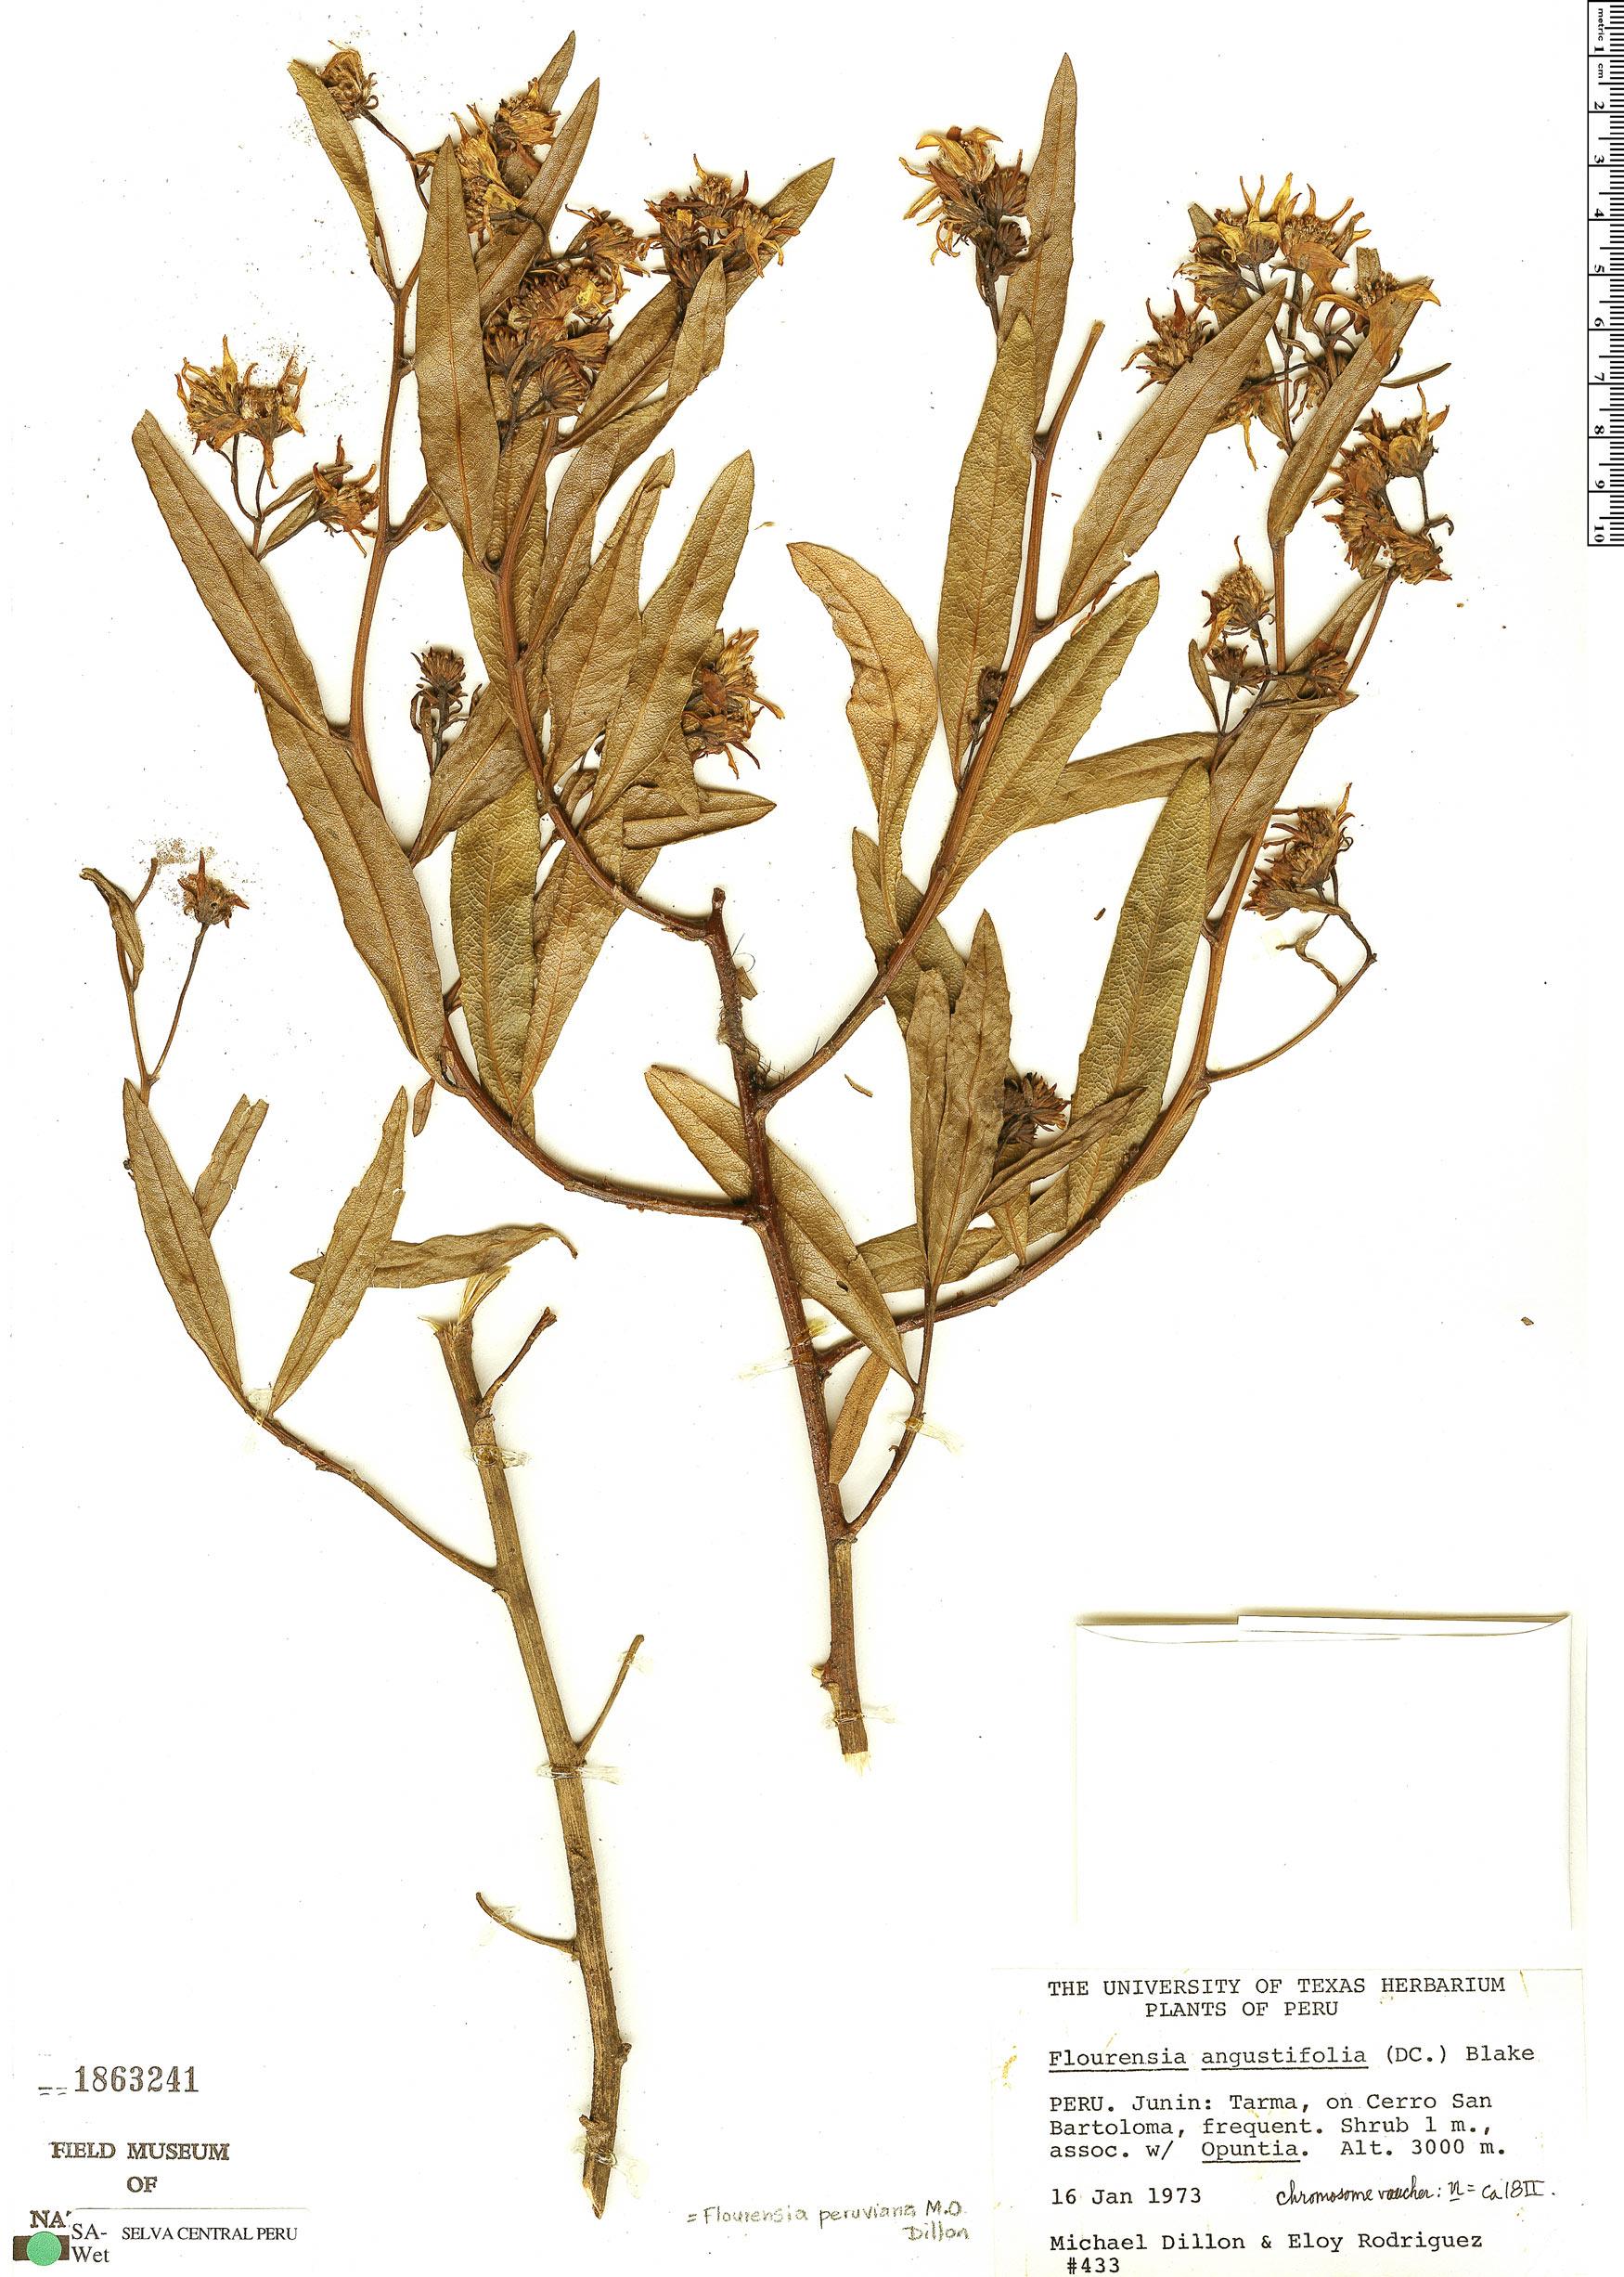 Specimen: Flourensia angustifolia